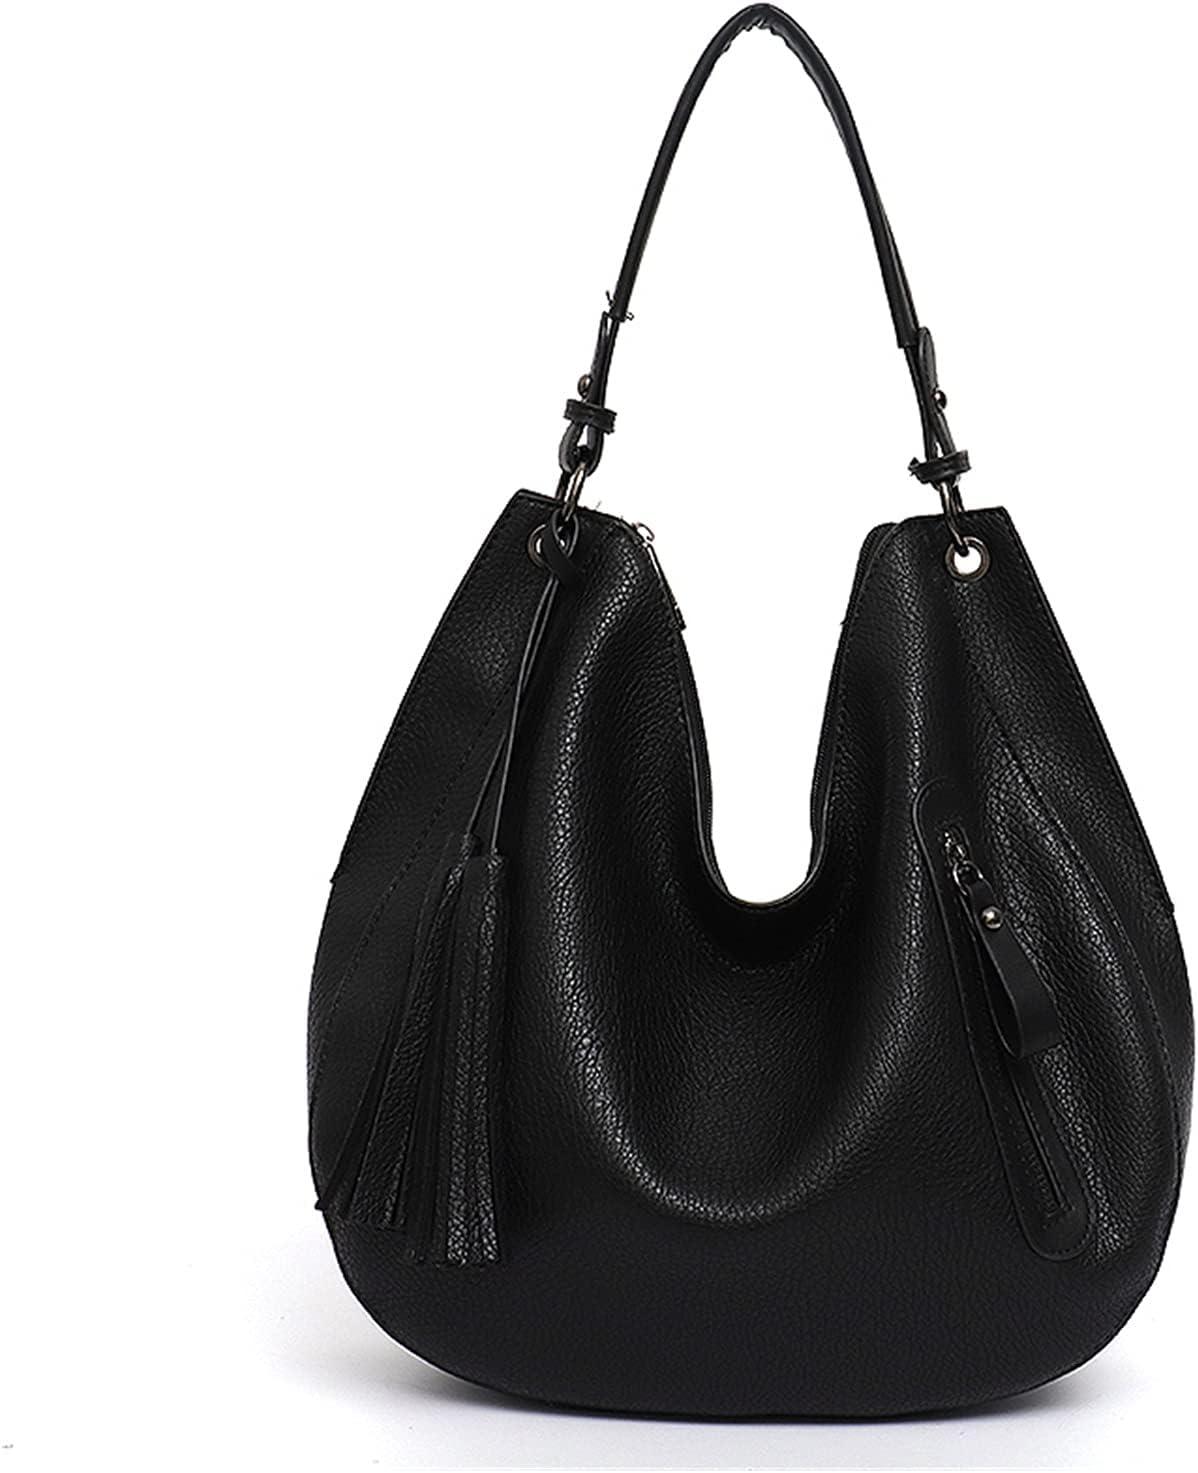 PJRYC FashionFemale Tramp Lady Under blast sales Soft Ranking TOP13 Casual F Tassel Bag Shoulder